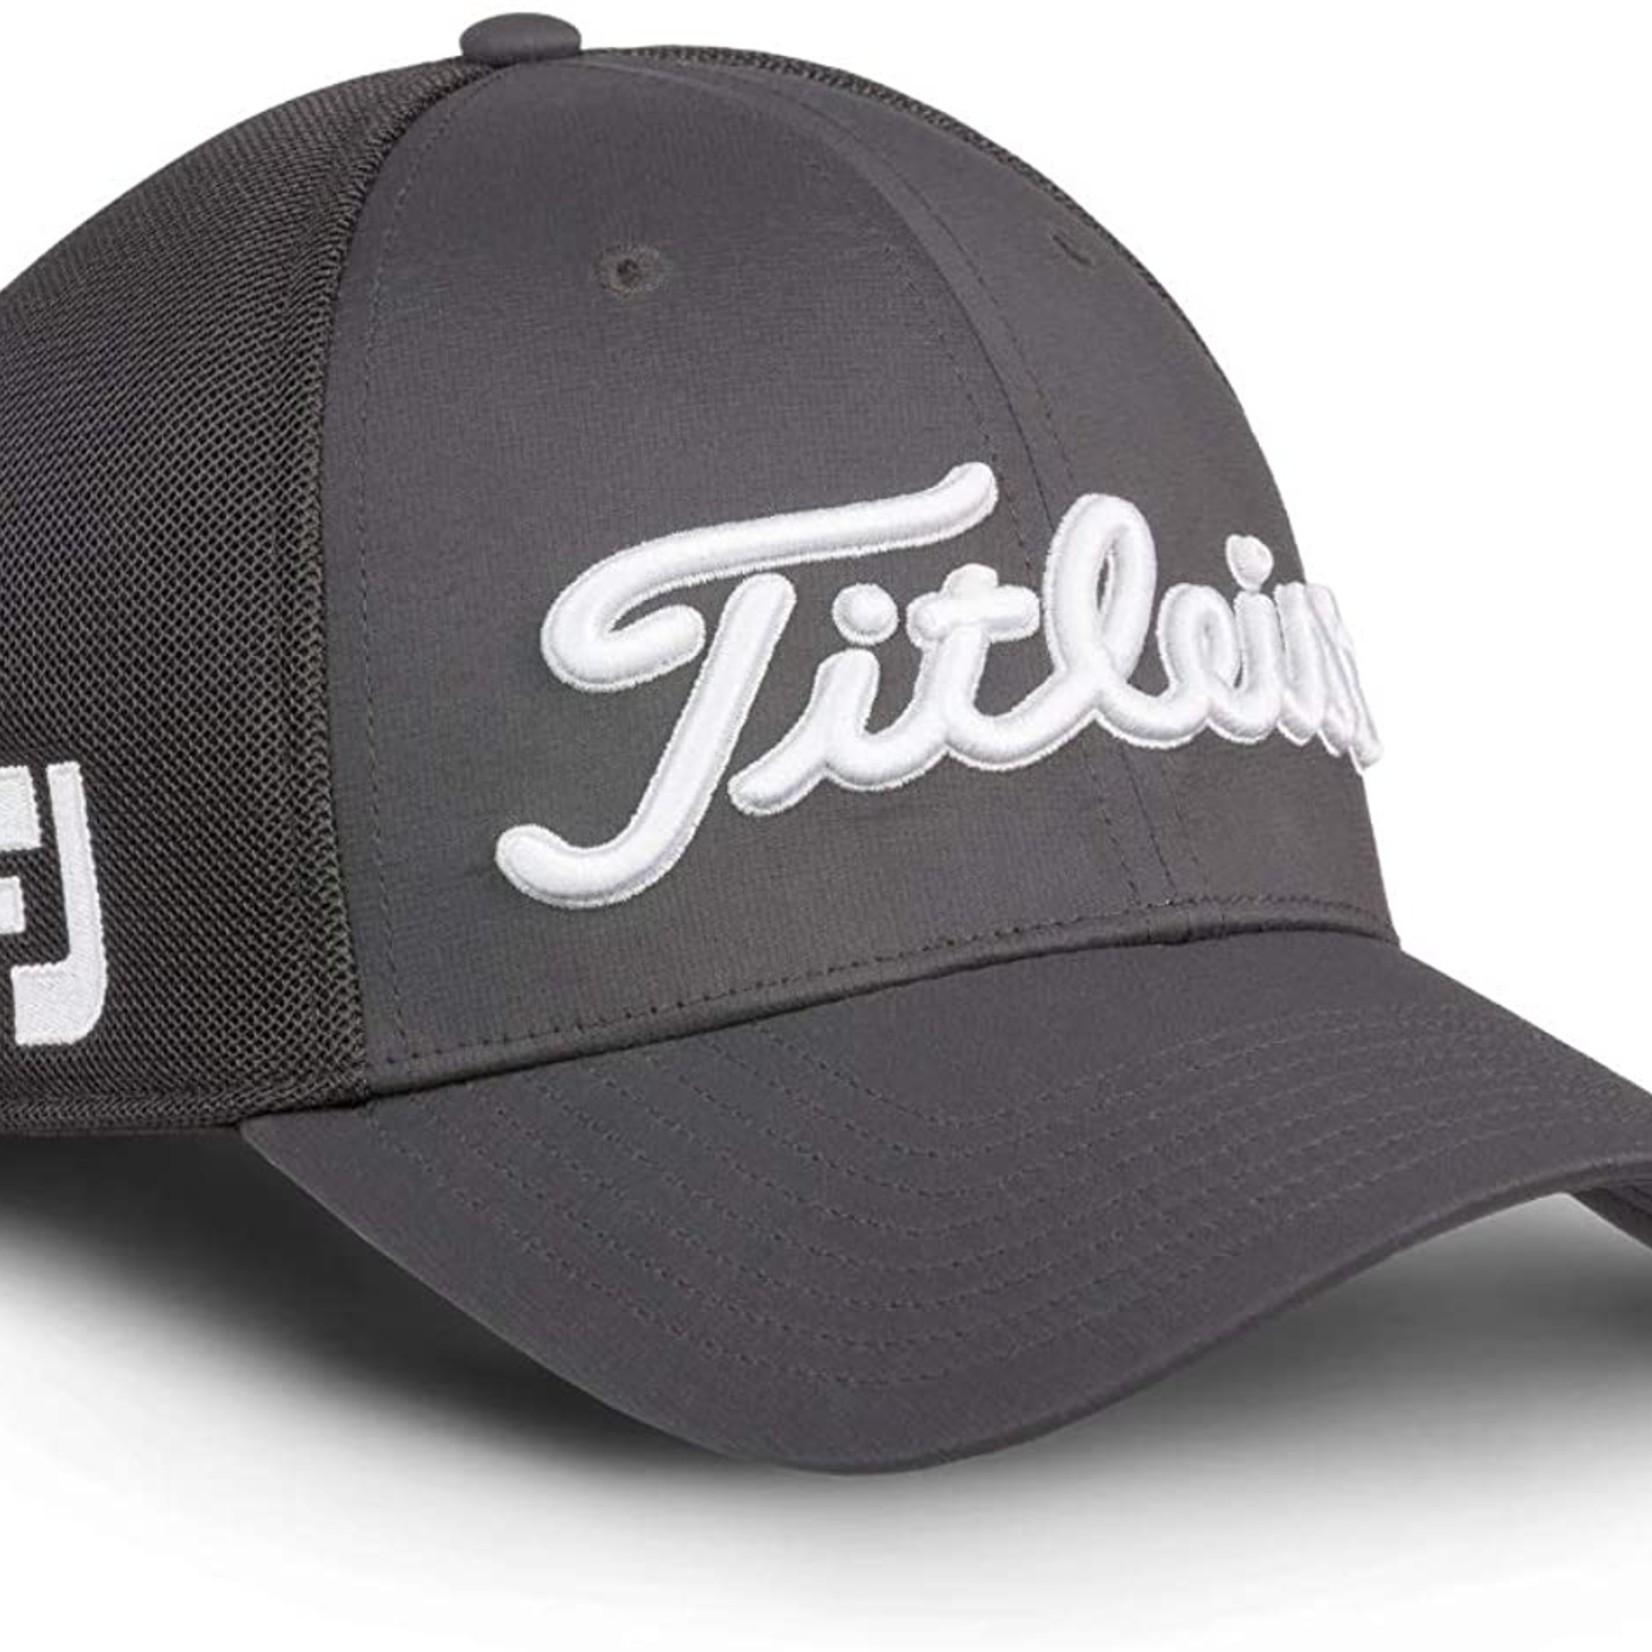 Titleist Titleist Men's Tour Elit  Legacy Hat